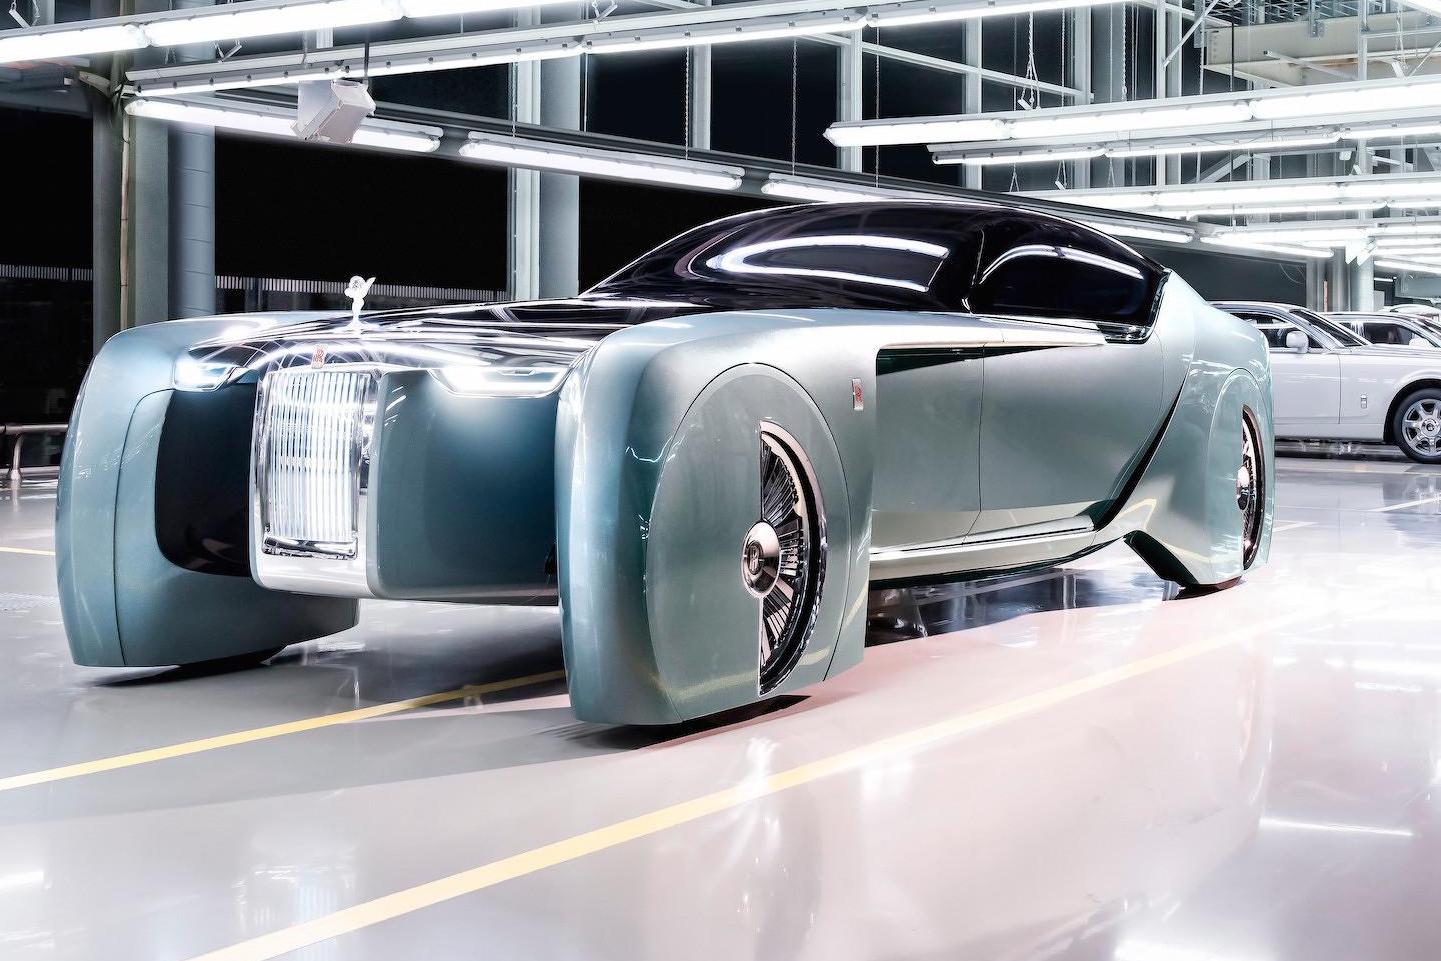 rolls-royce-vision-next-100-concept5.jpg